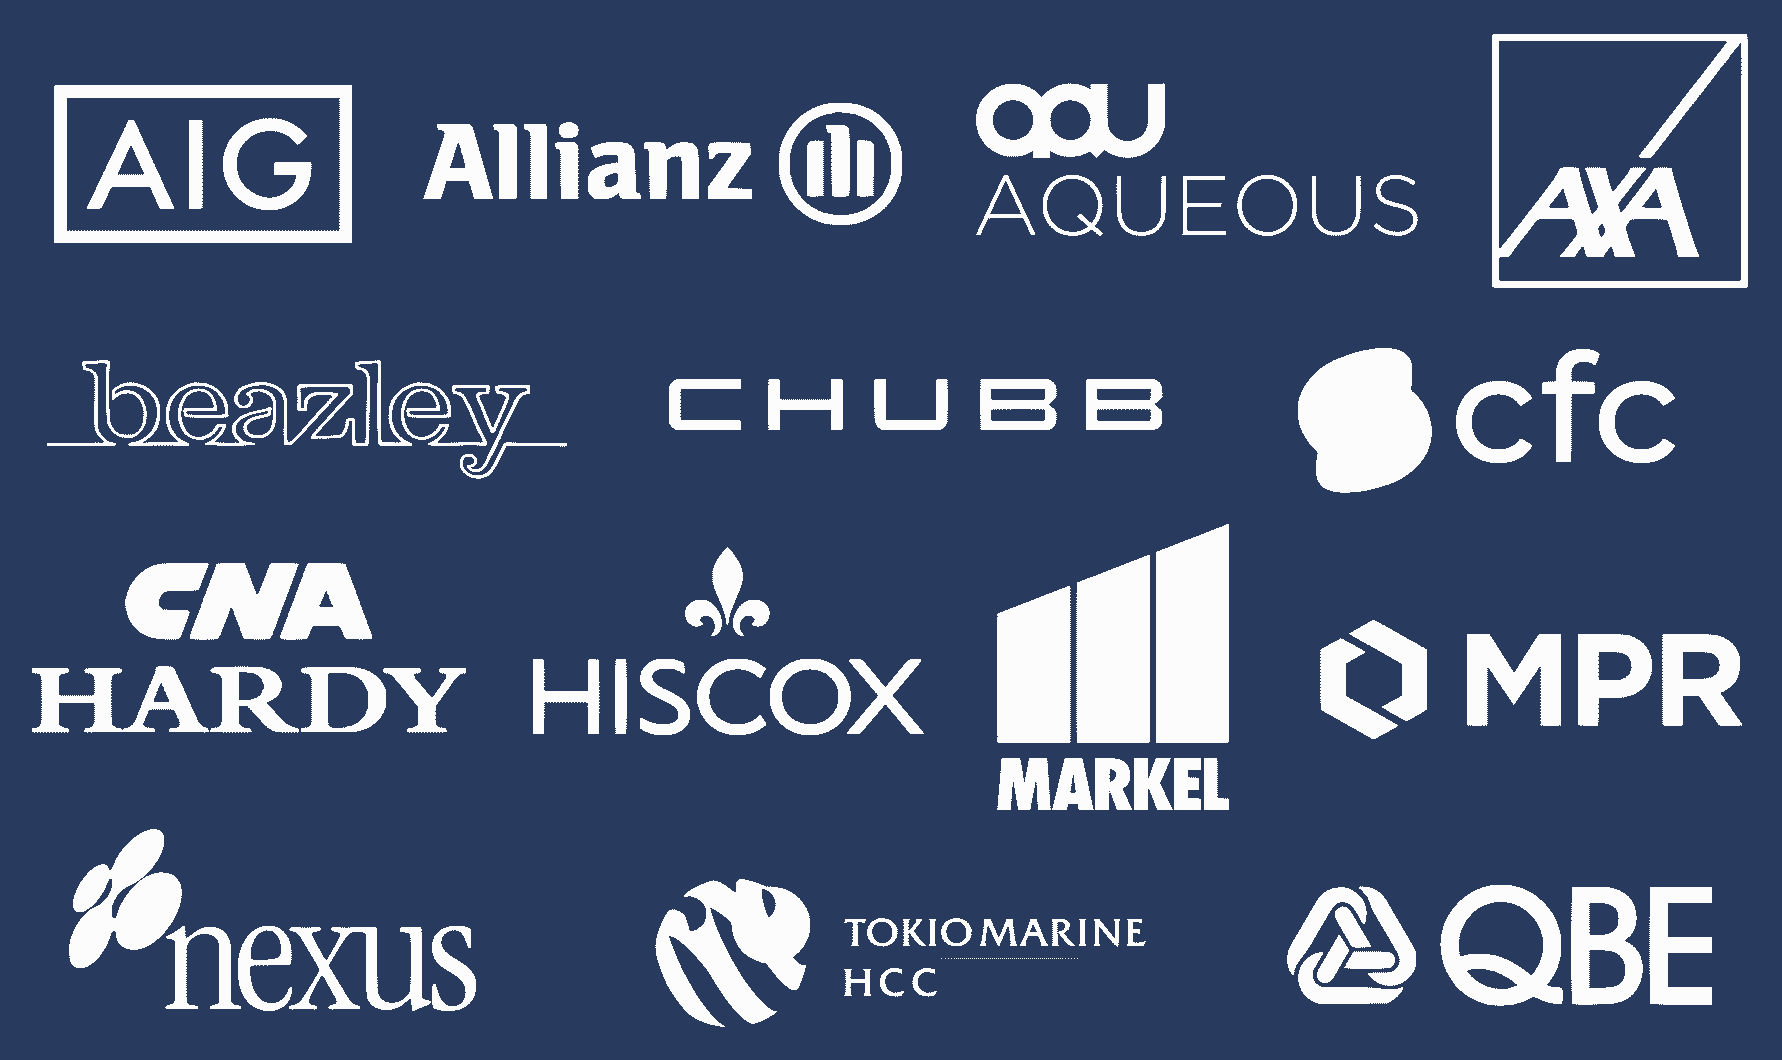 Leading PI insurance providers include: AIG, Allianz, Aqueous, AXA, Beazley, Chubb, CFC, CNA Hardy, Hiscox, Markel, MPR, Nexus, Tokio Marine, and QBE.